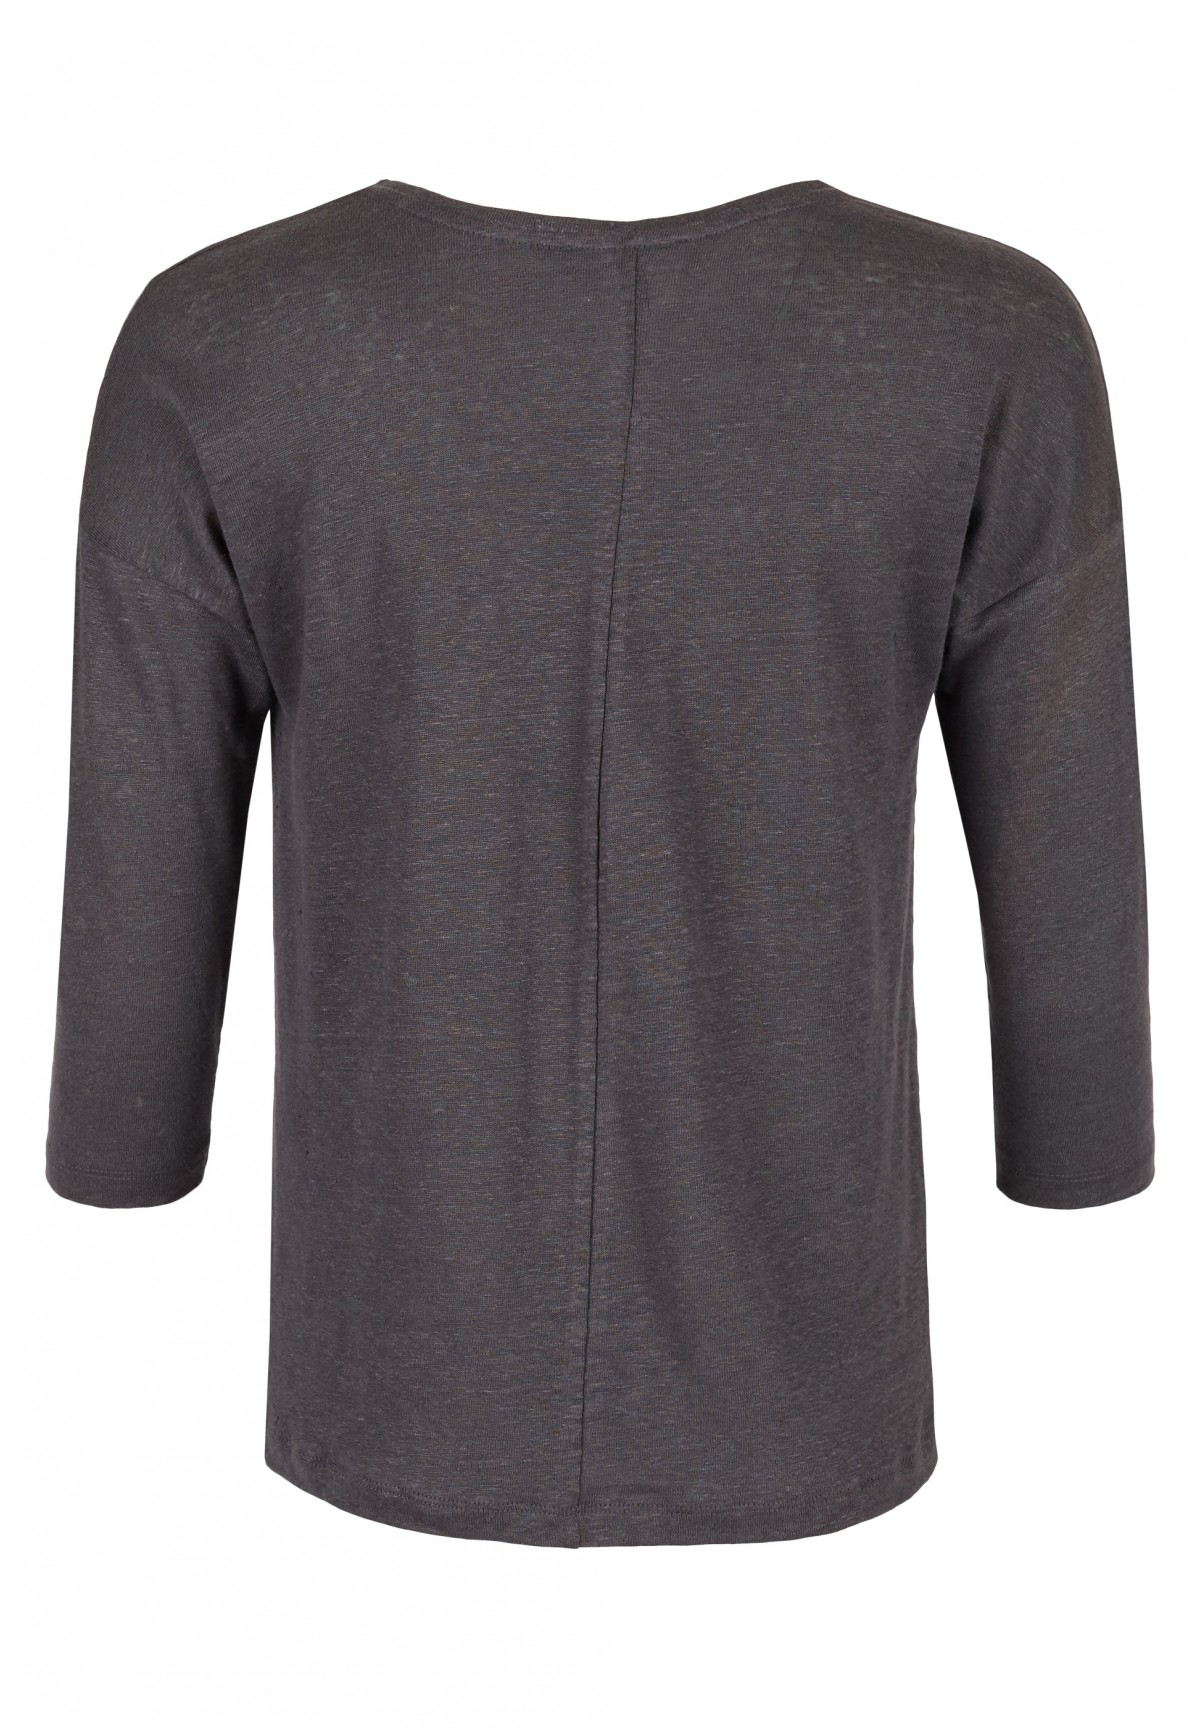 Basic-Shirt mit Rundhalsausschnitt / Shirt